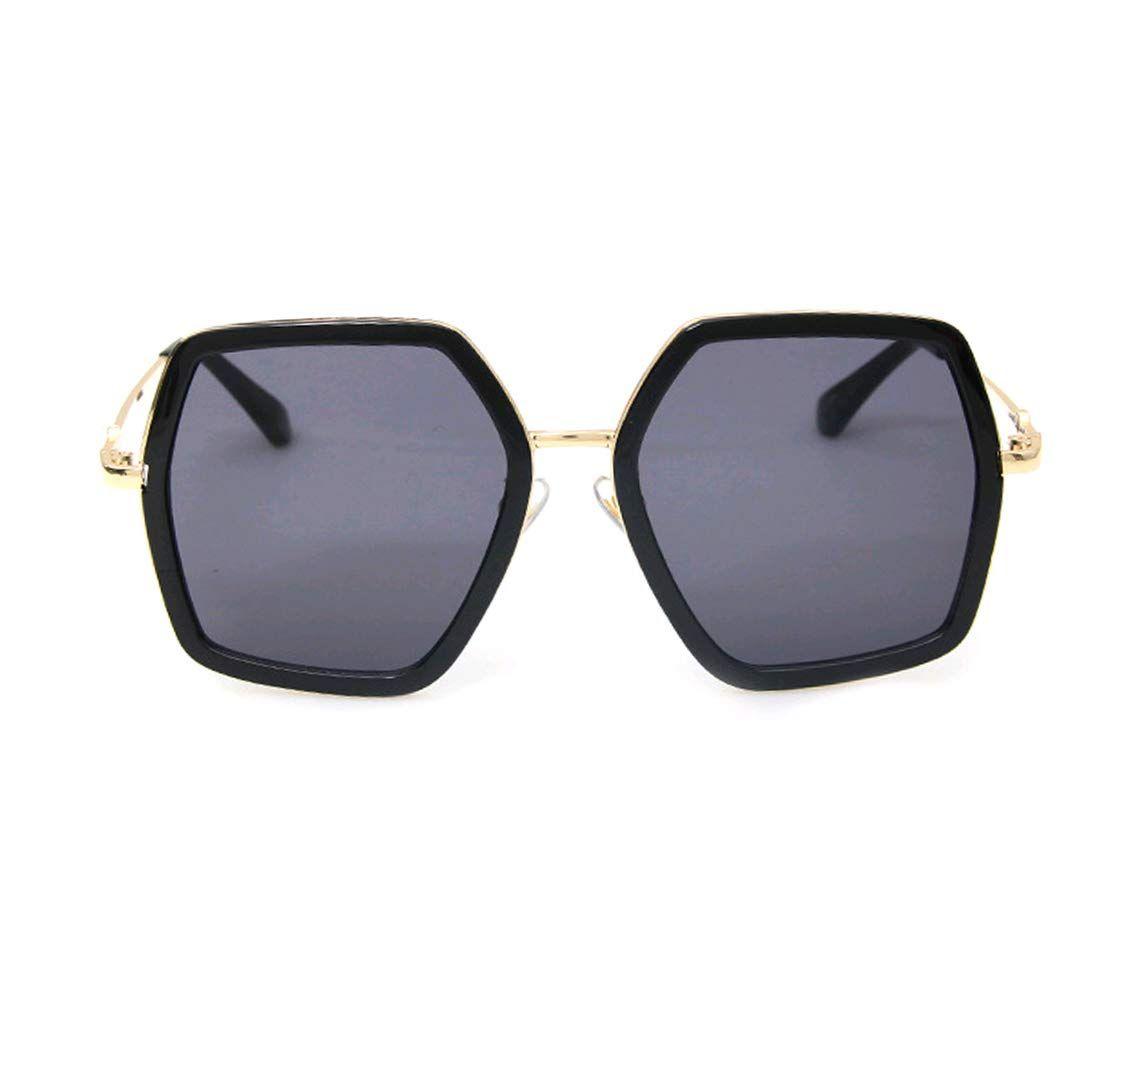 bd6e9f6ce646 Amazon.com: GAMT Oversized Square Sunglasses Women Vintage UV Protection  irregular Brand Designer Shades Black: Clothing | @giftryapp